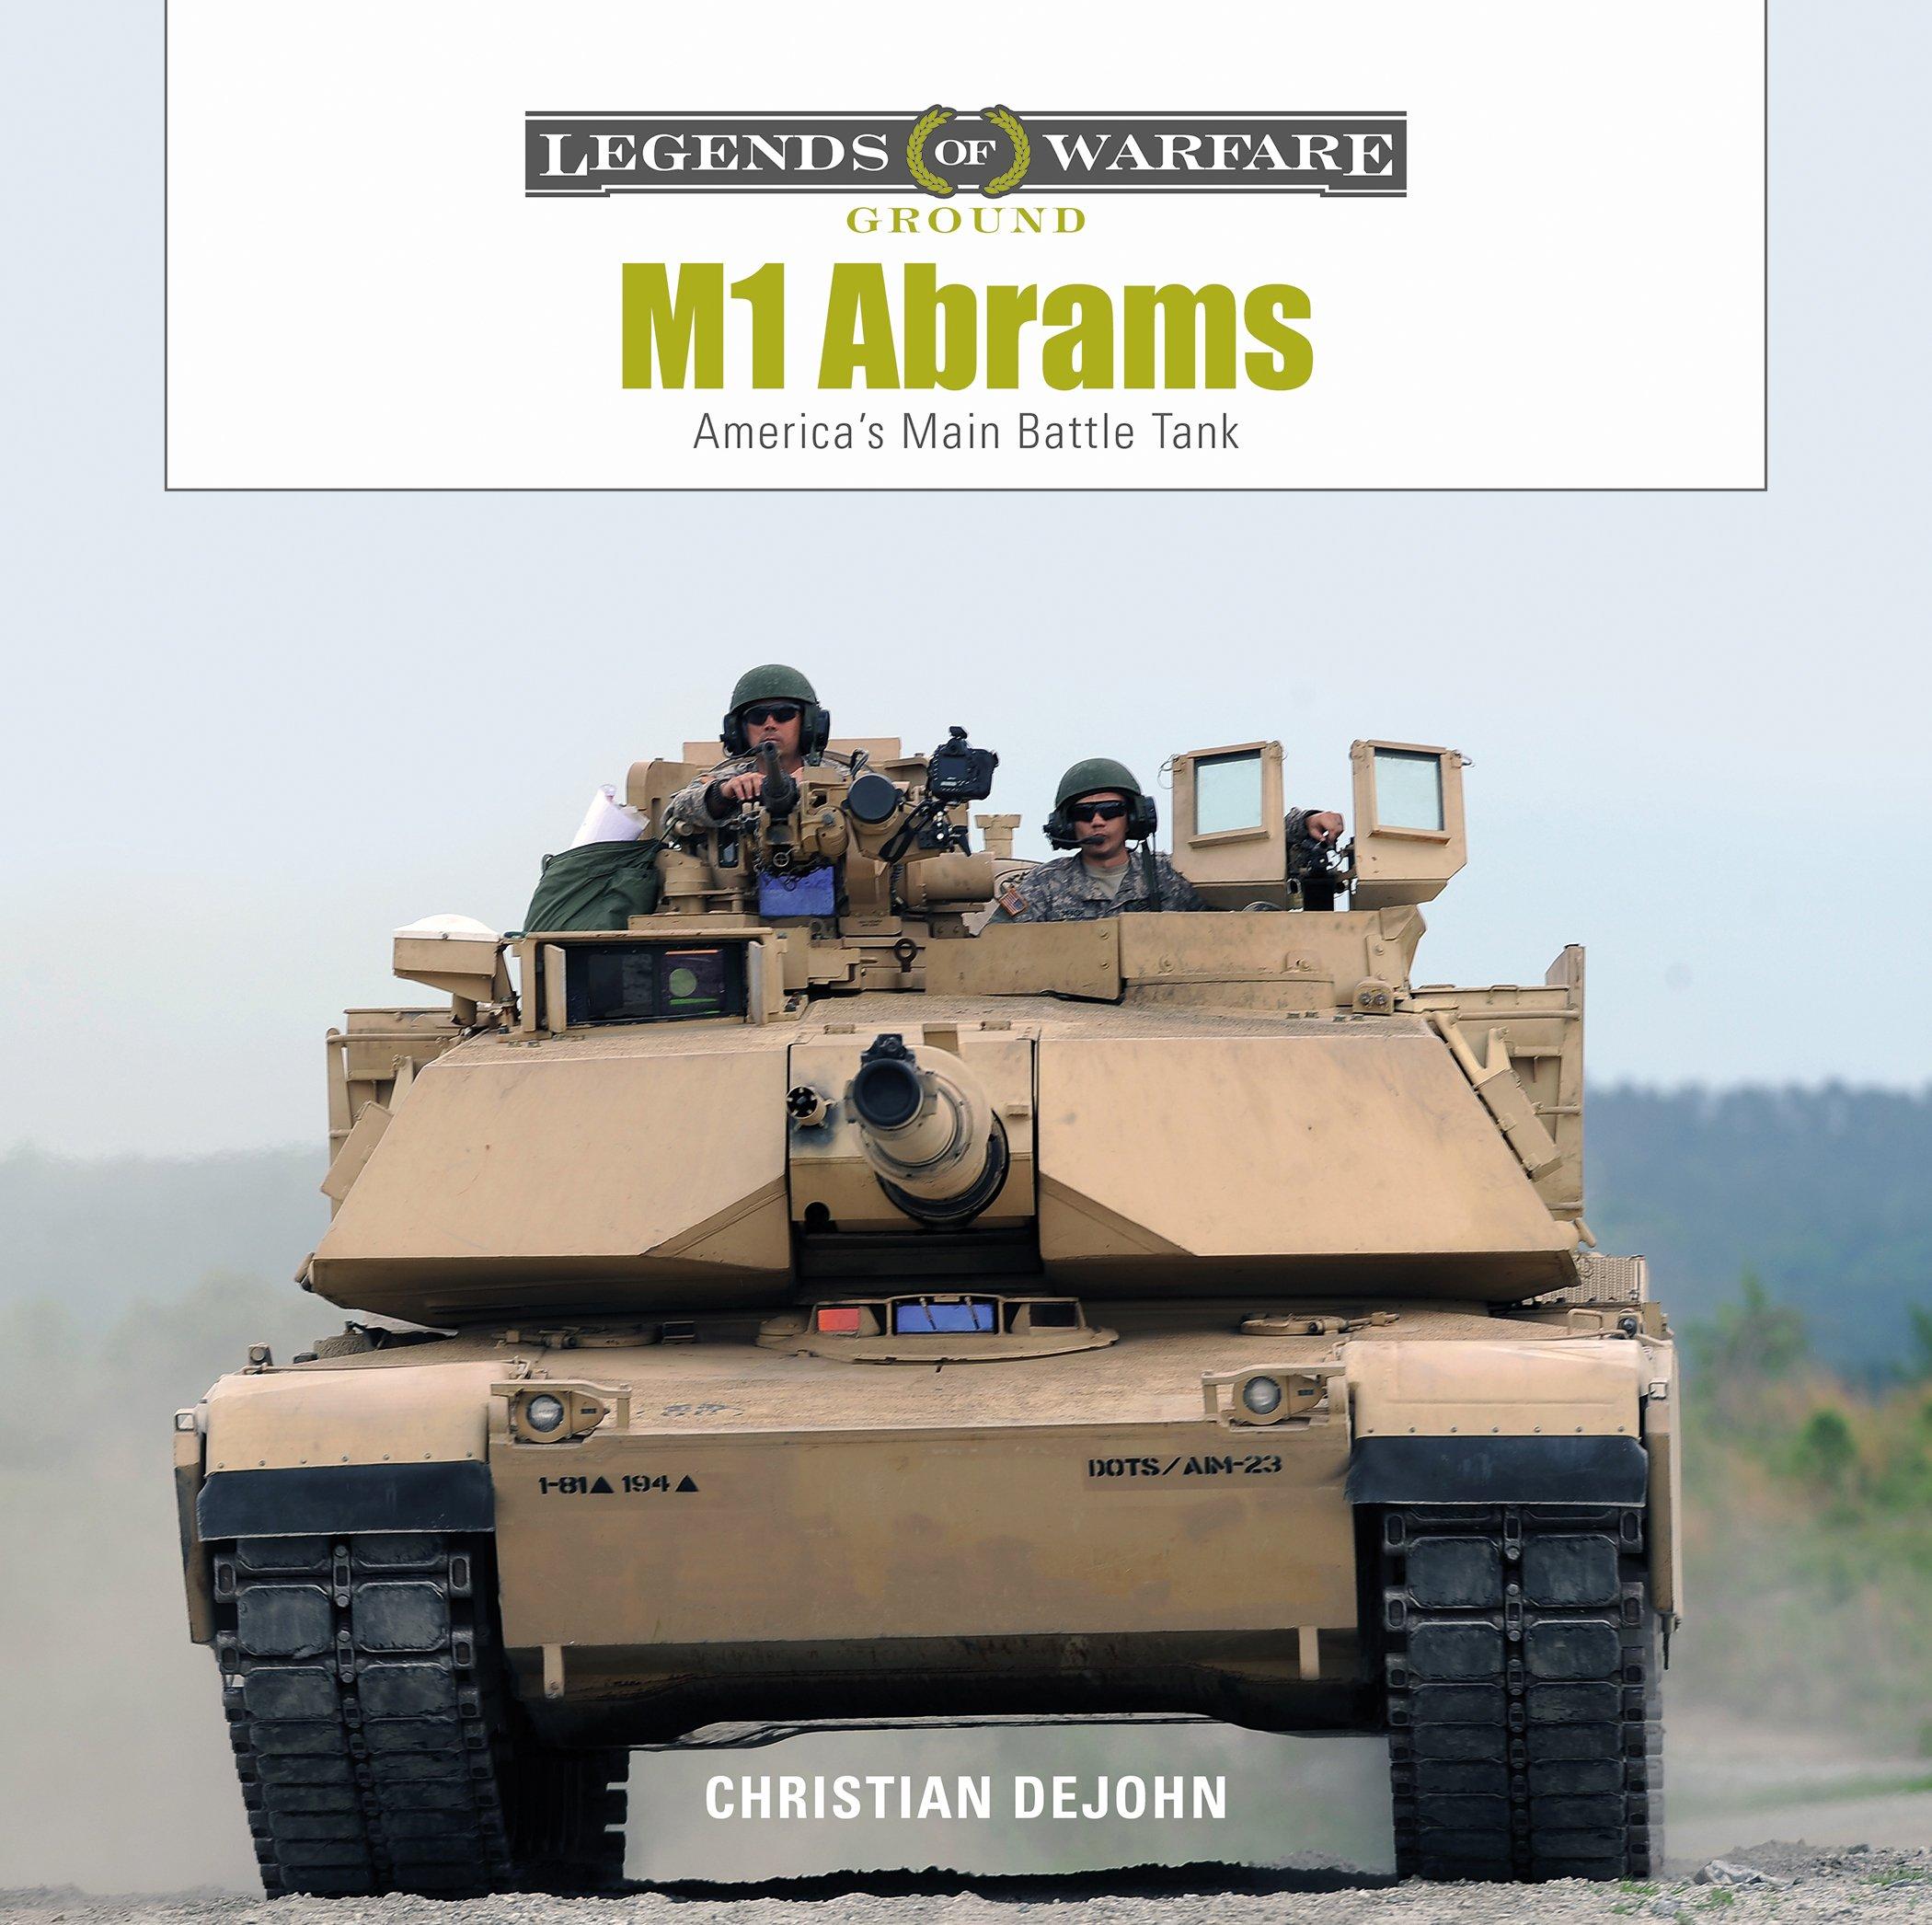 4c03c68883c4 M1 Abrams  America s Main Battle Tank (Legends of Warfare  Ground)  Hardcover – February 28